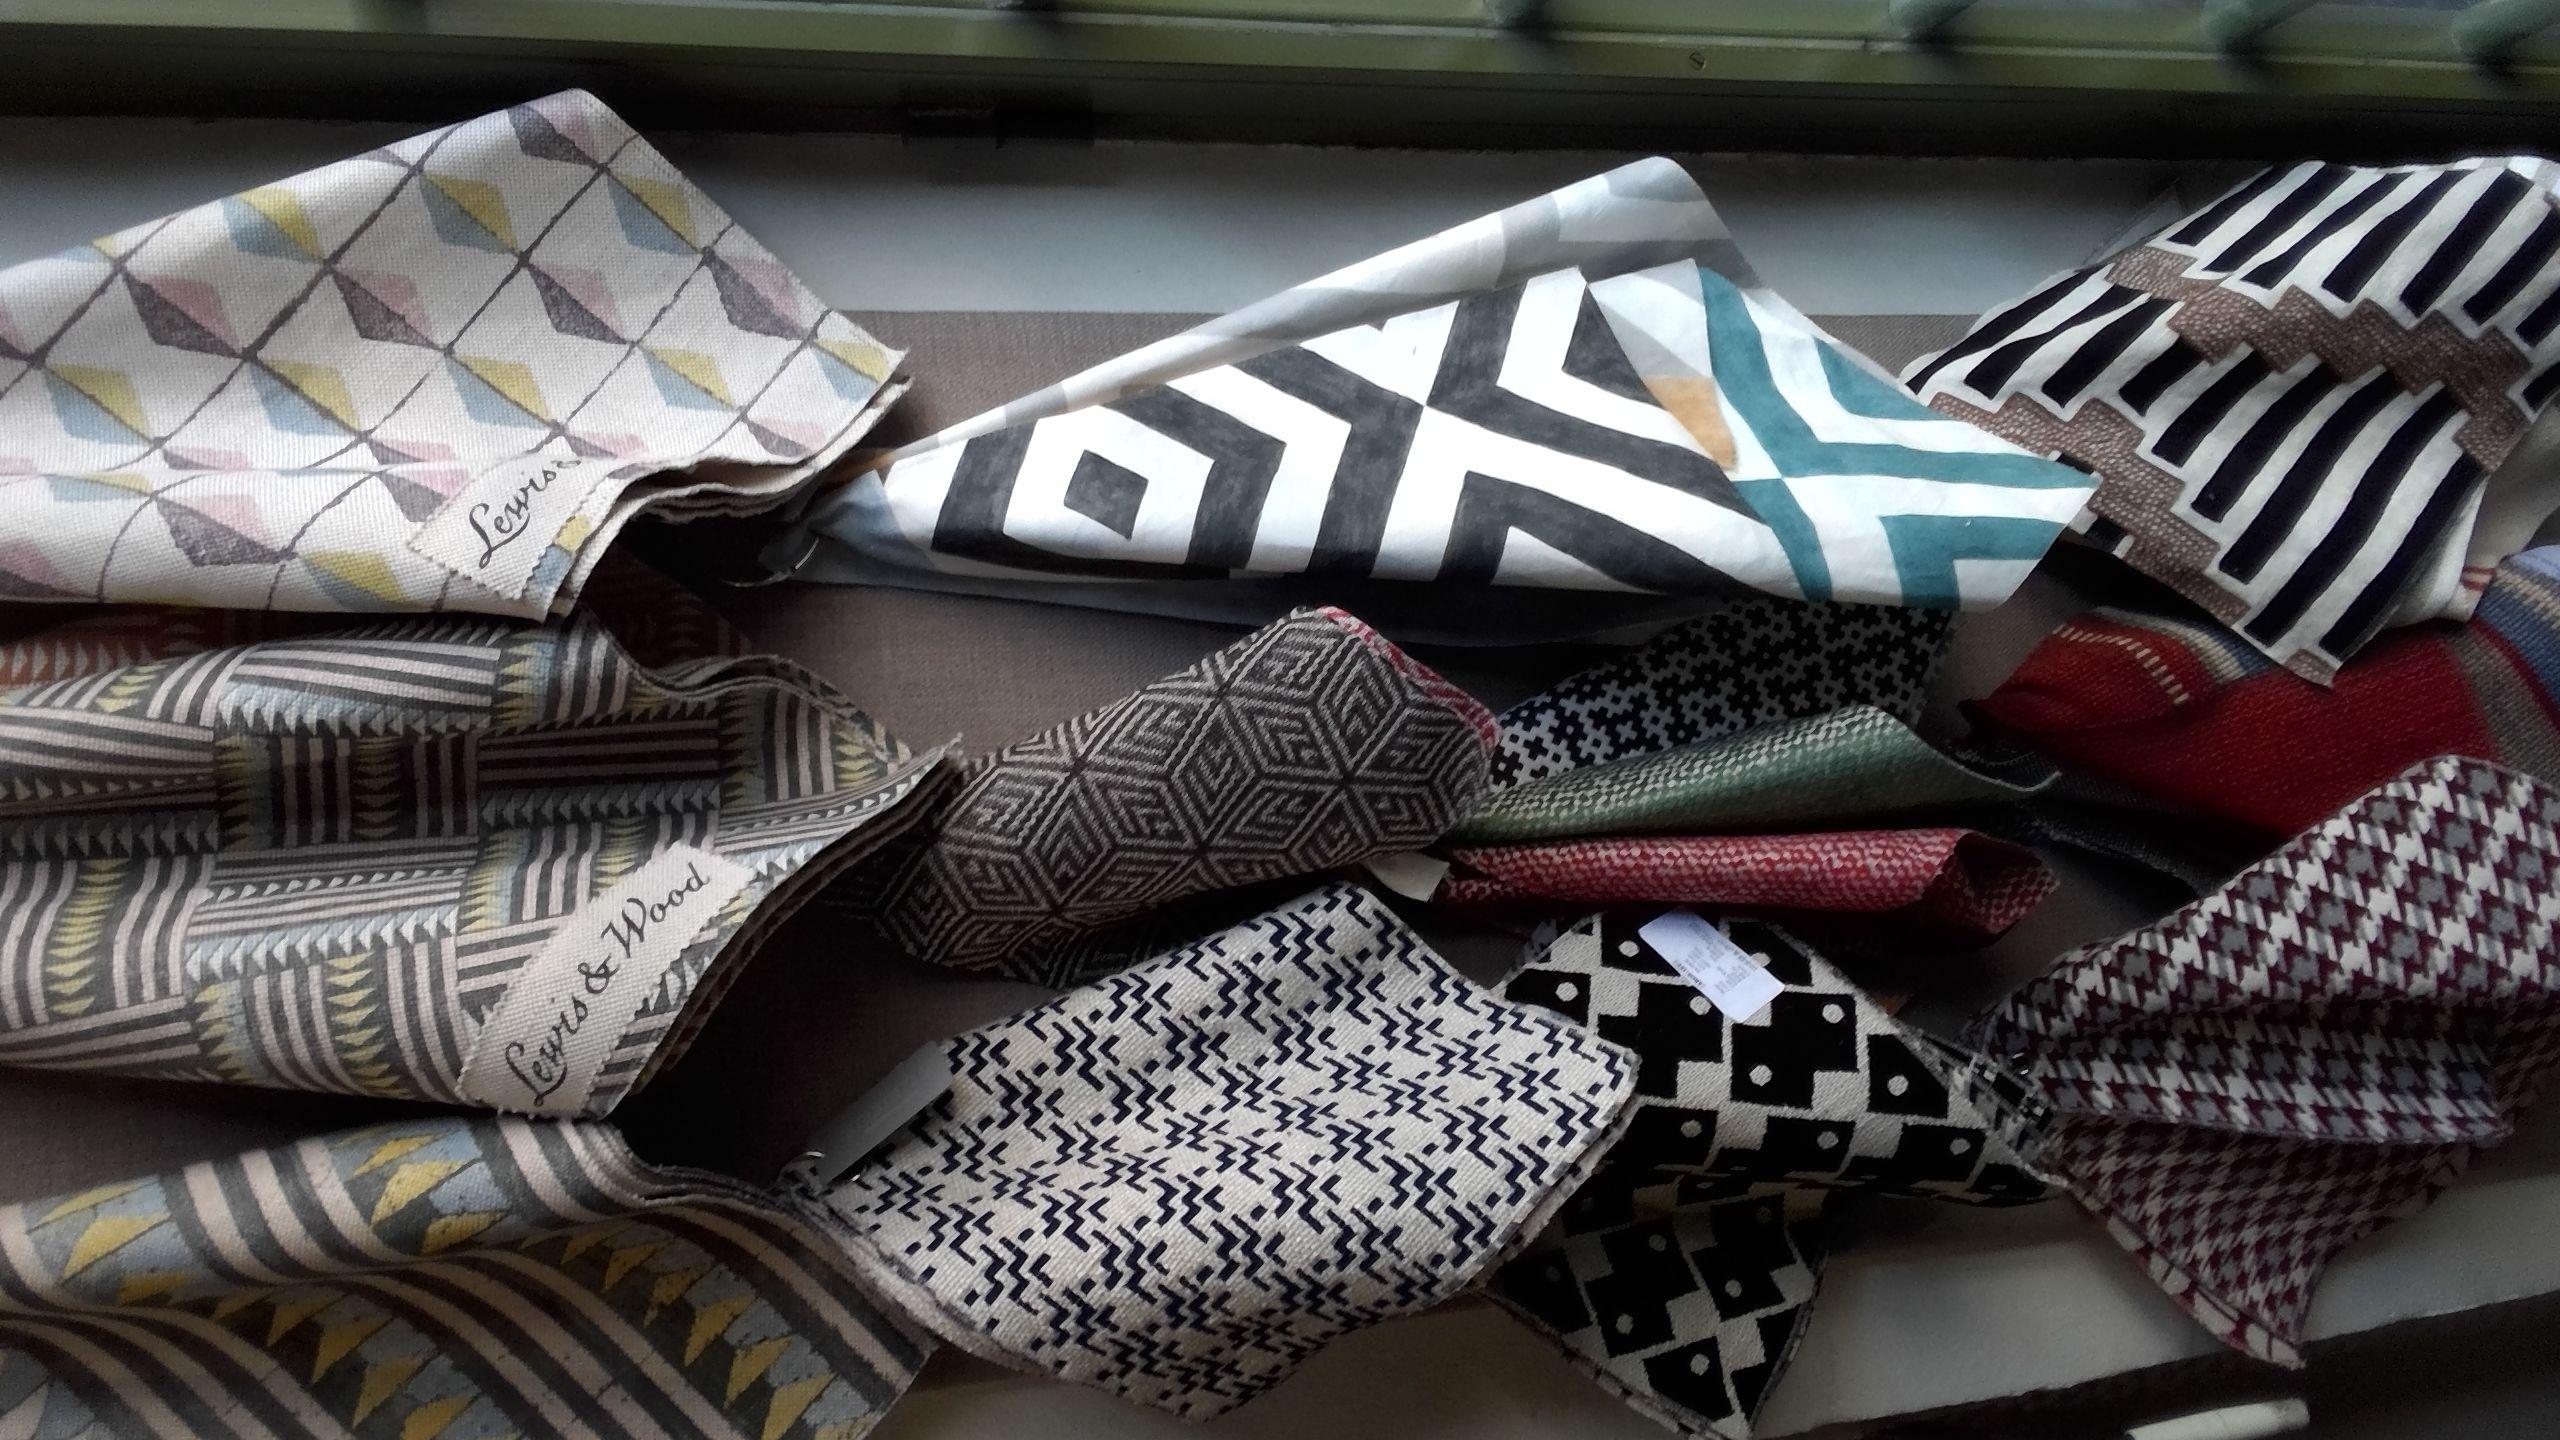 Foto 79 de Decoración textil en Madrid | Diseño Textil